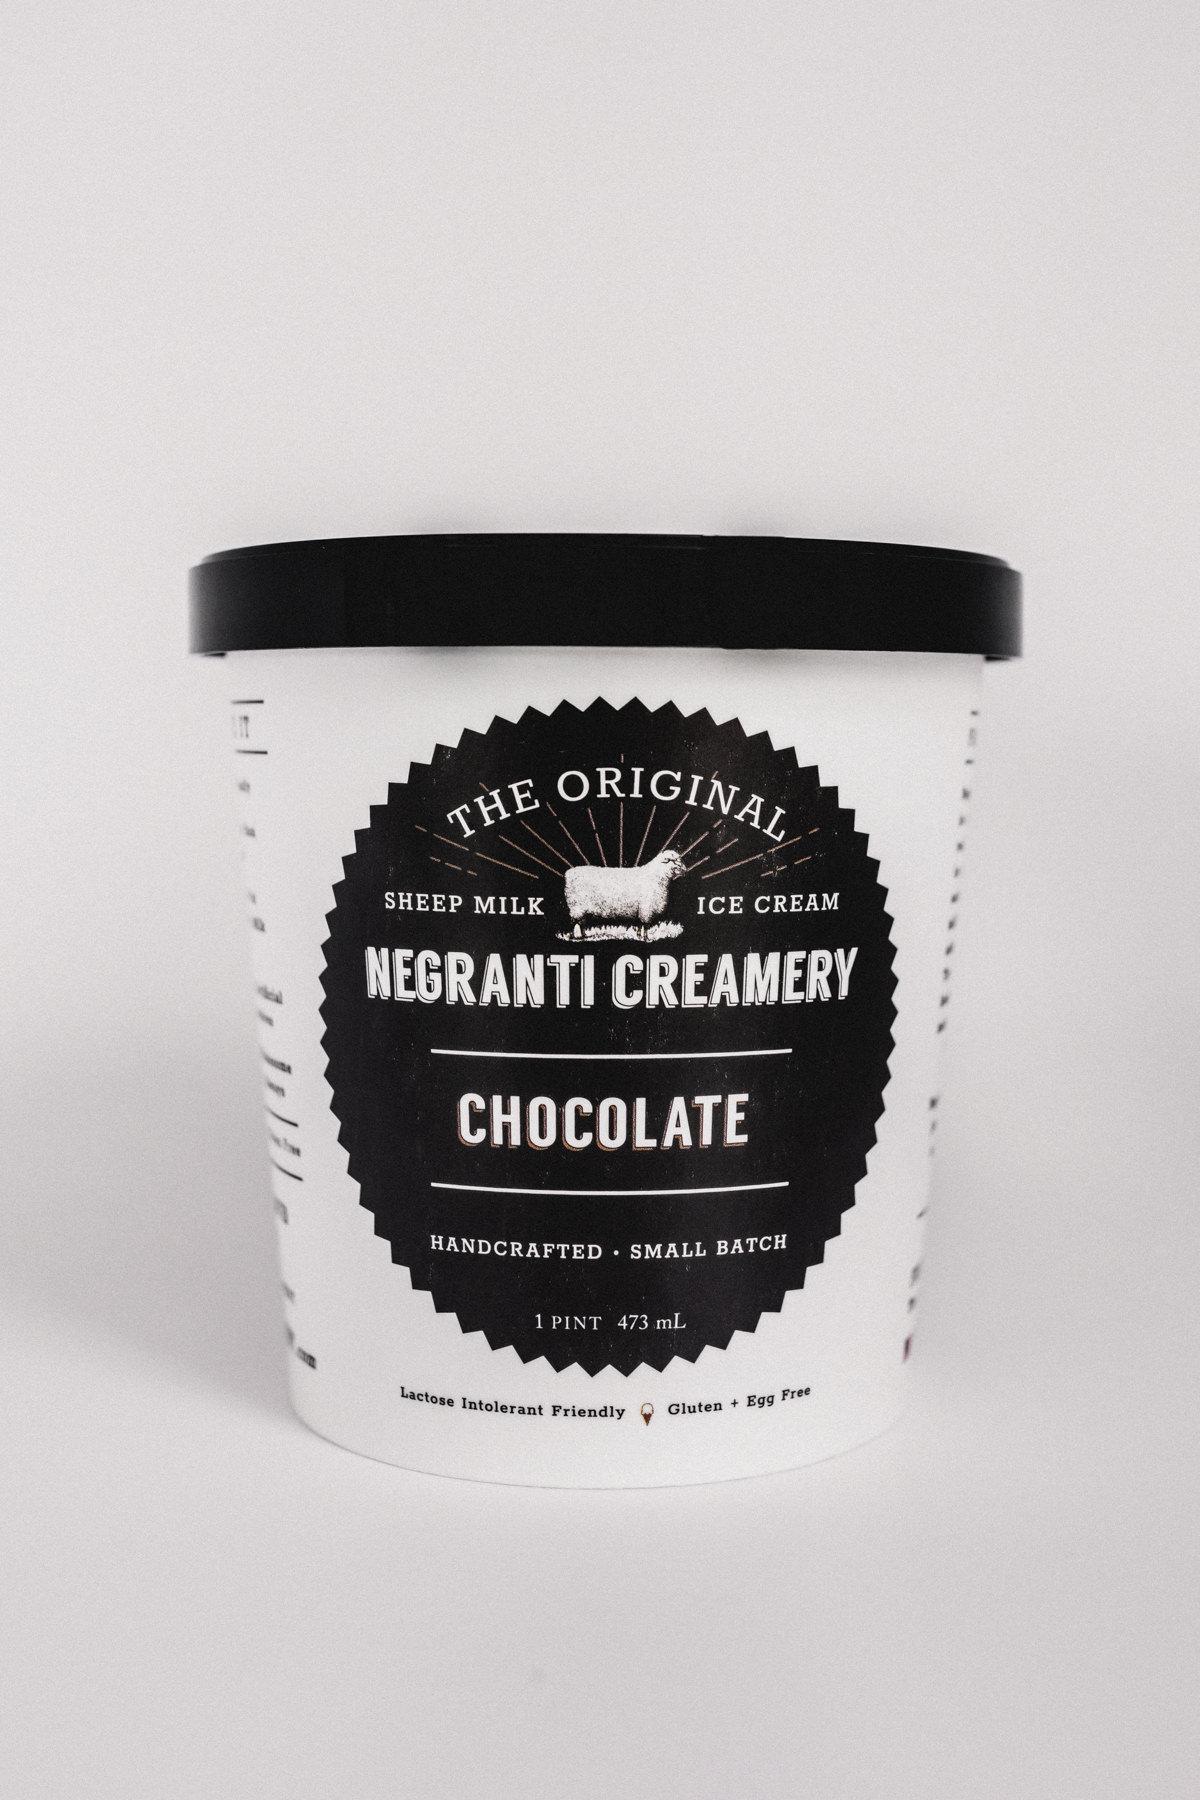 Product-Photography-Negranti-Creamery-Paso-Robles-California-805-Media-8.jpg